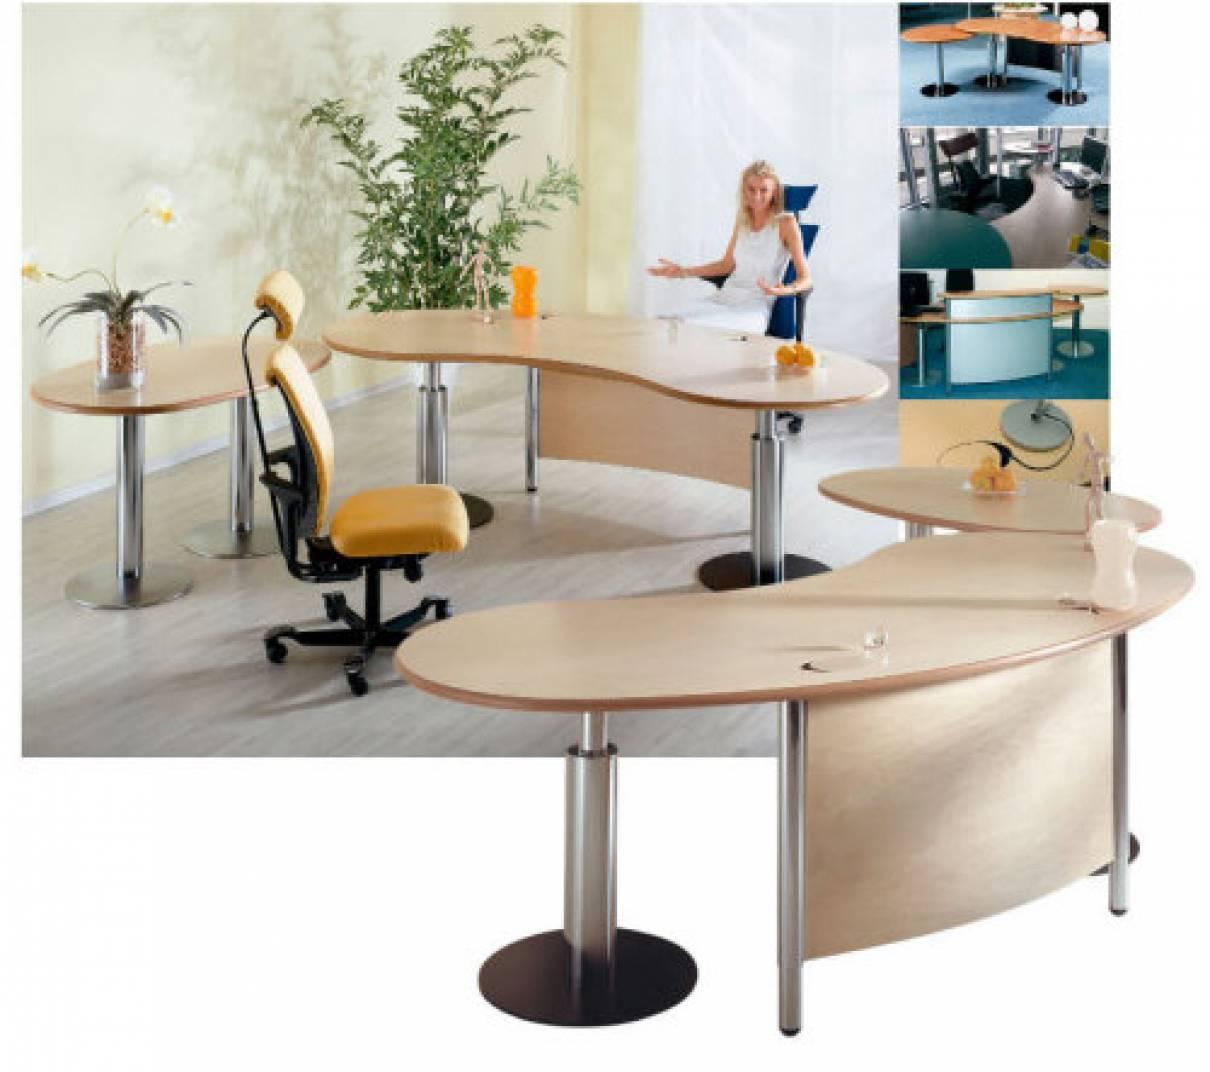 Desks Infinity Design C Style Elegant Cable Management